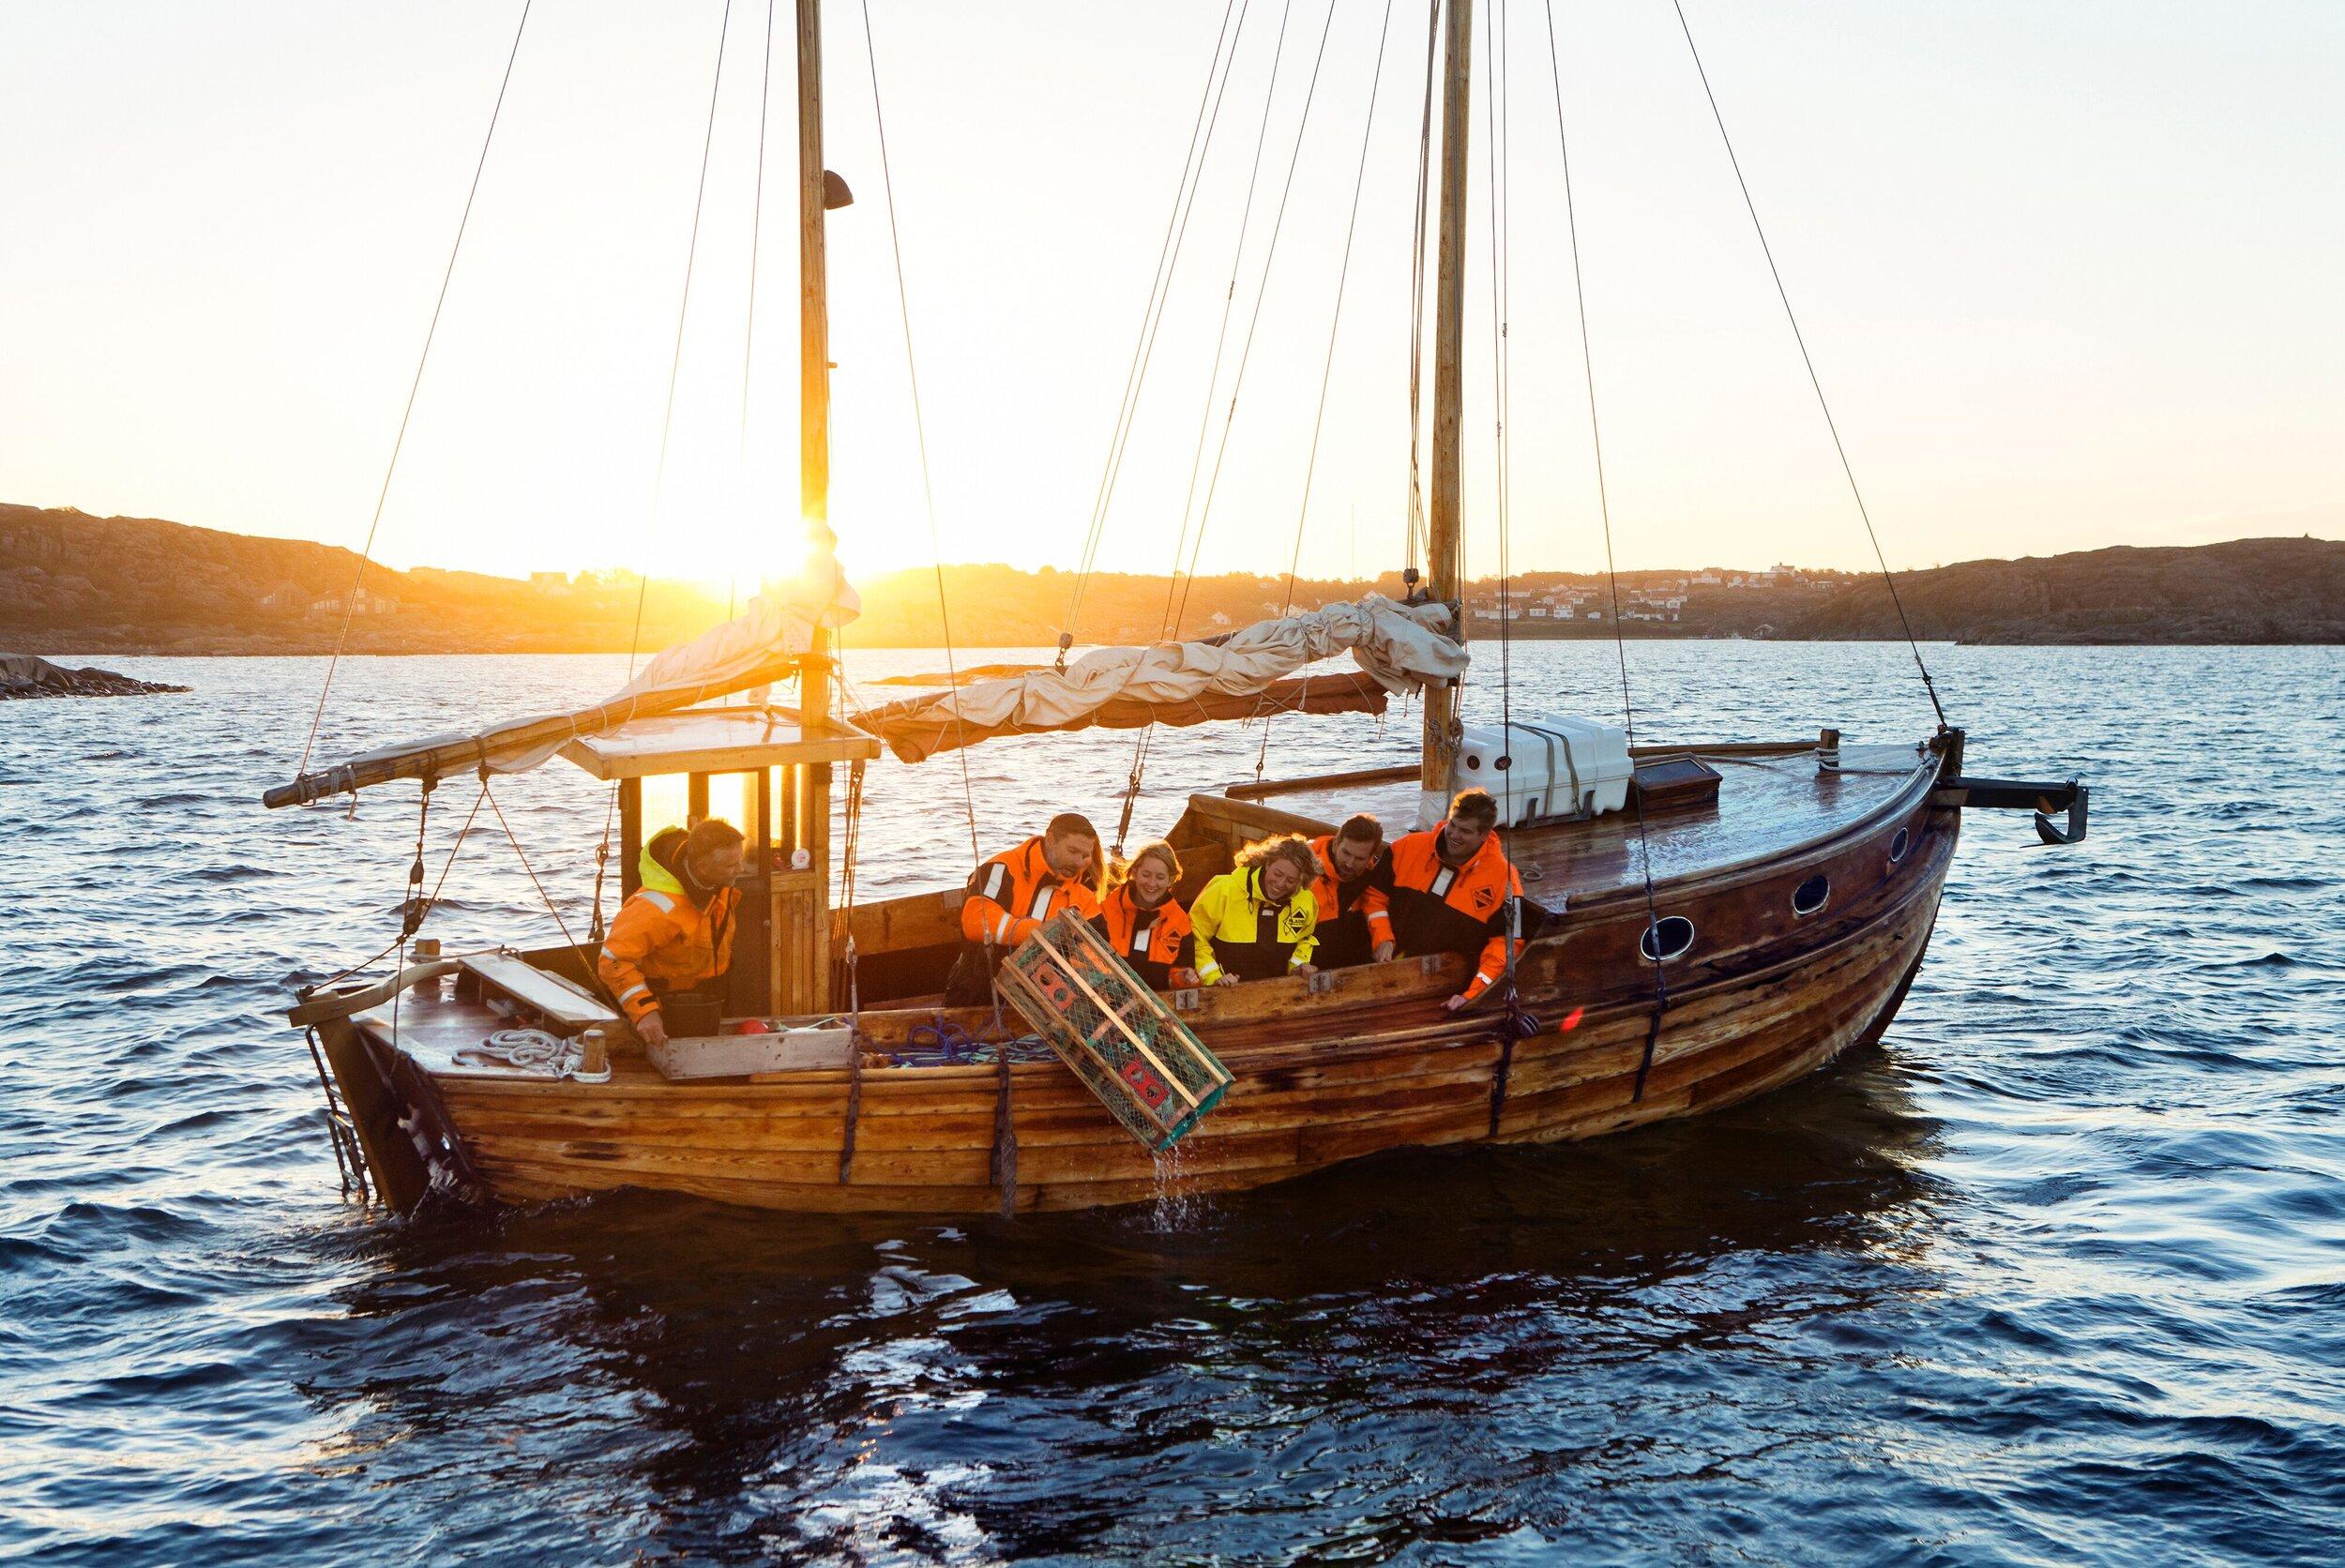 Er du klar for hummerfiske på den svenske vestkysten?                         Foto: Robert Borgelid/Visit Sweden